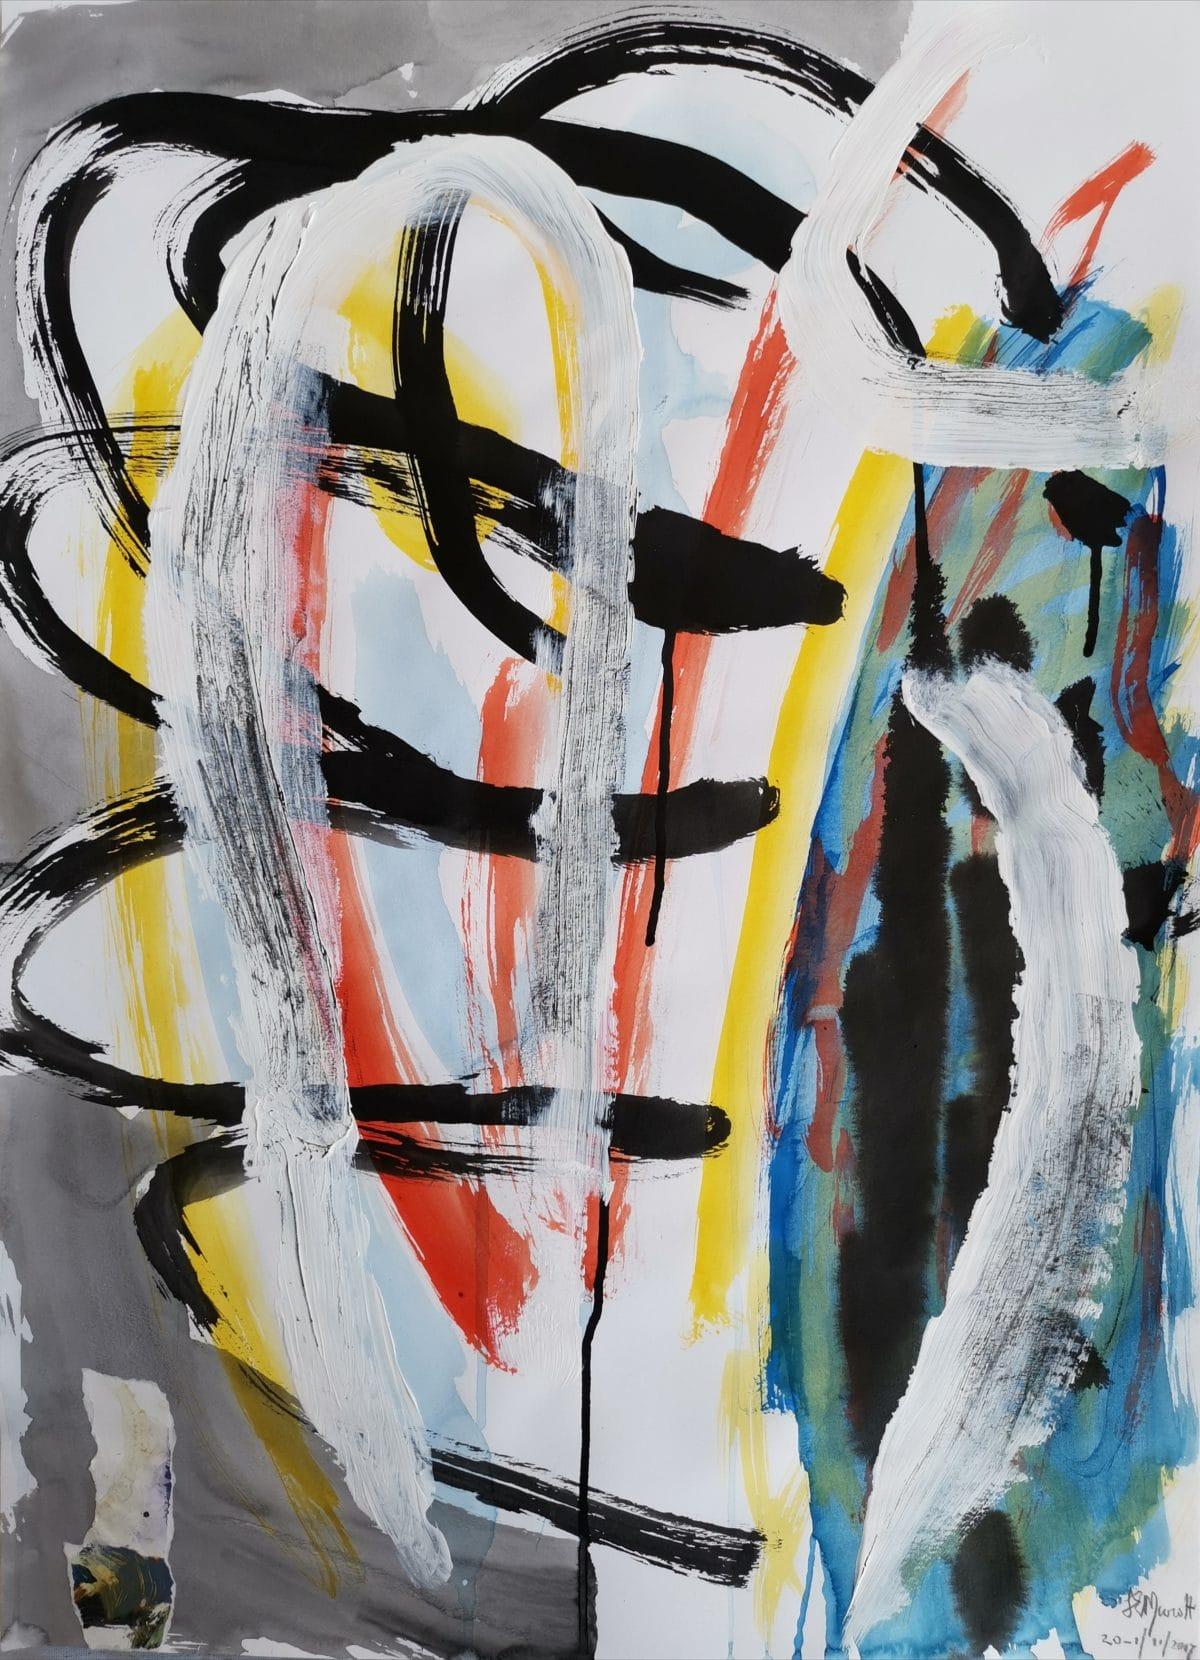 Lionel Murcott - Mixed Media on Fabriano 70 x 50 cm